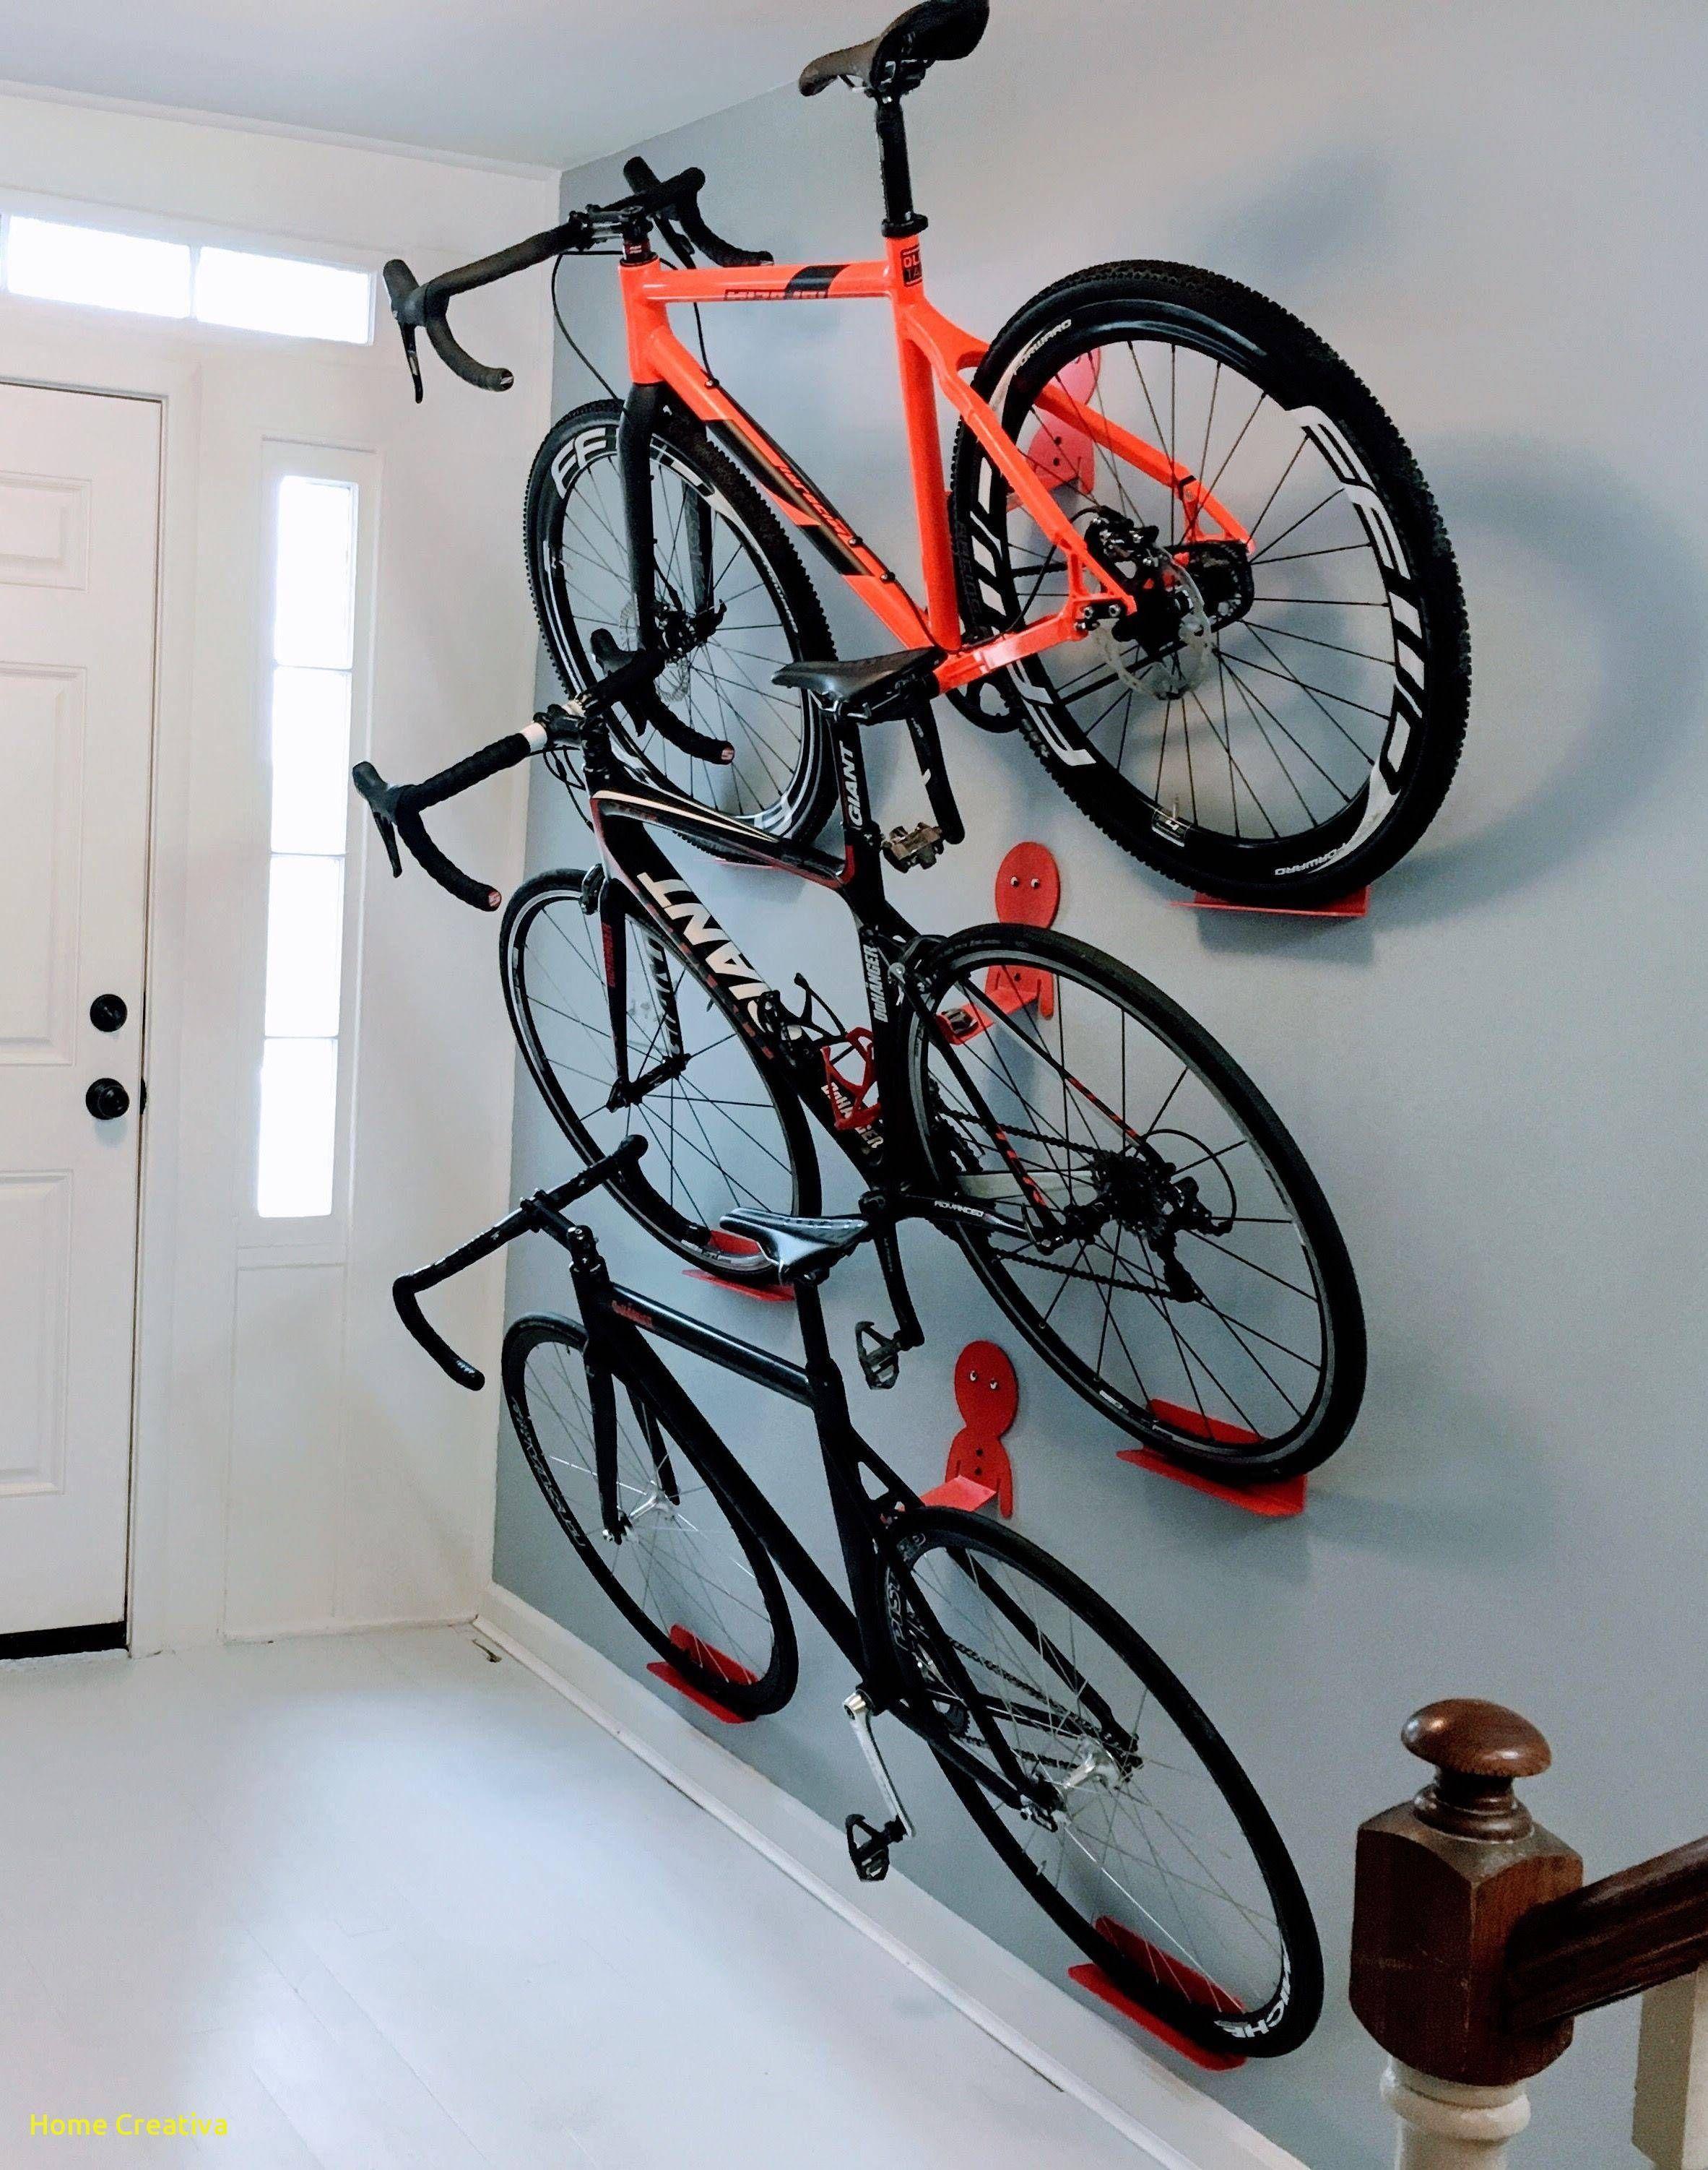 Exceptional Bike Holder Wall Https Homecreativa Com Bike Holder Wall Homedecoration Homedecorations Bike Wall Storage Bike Rack Wall Bike Wall Mount